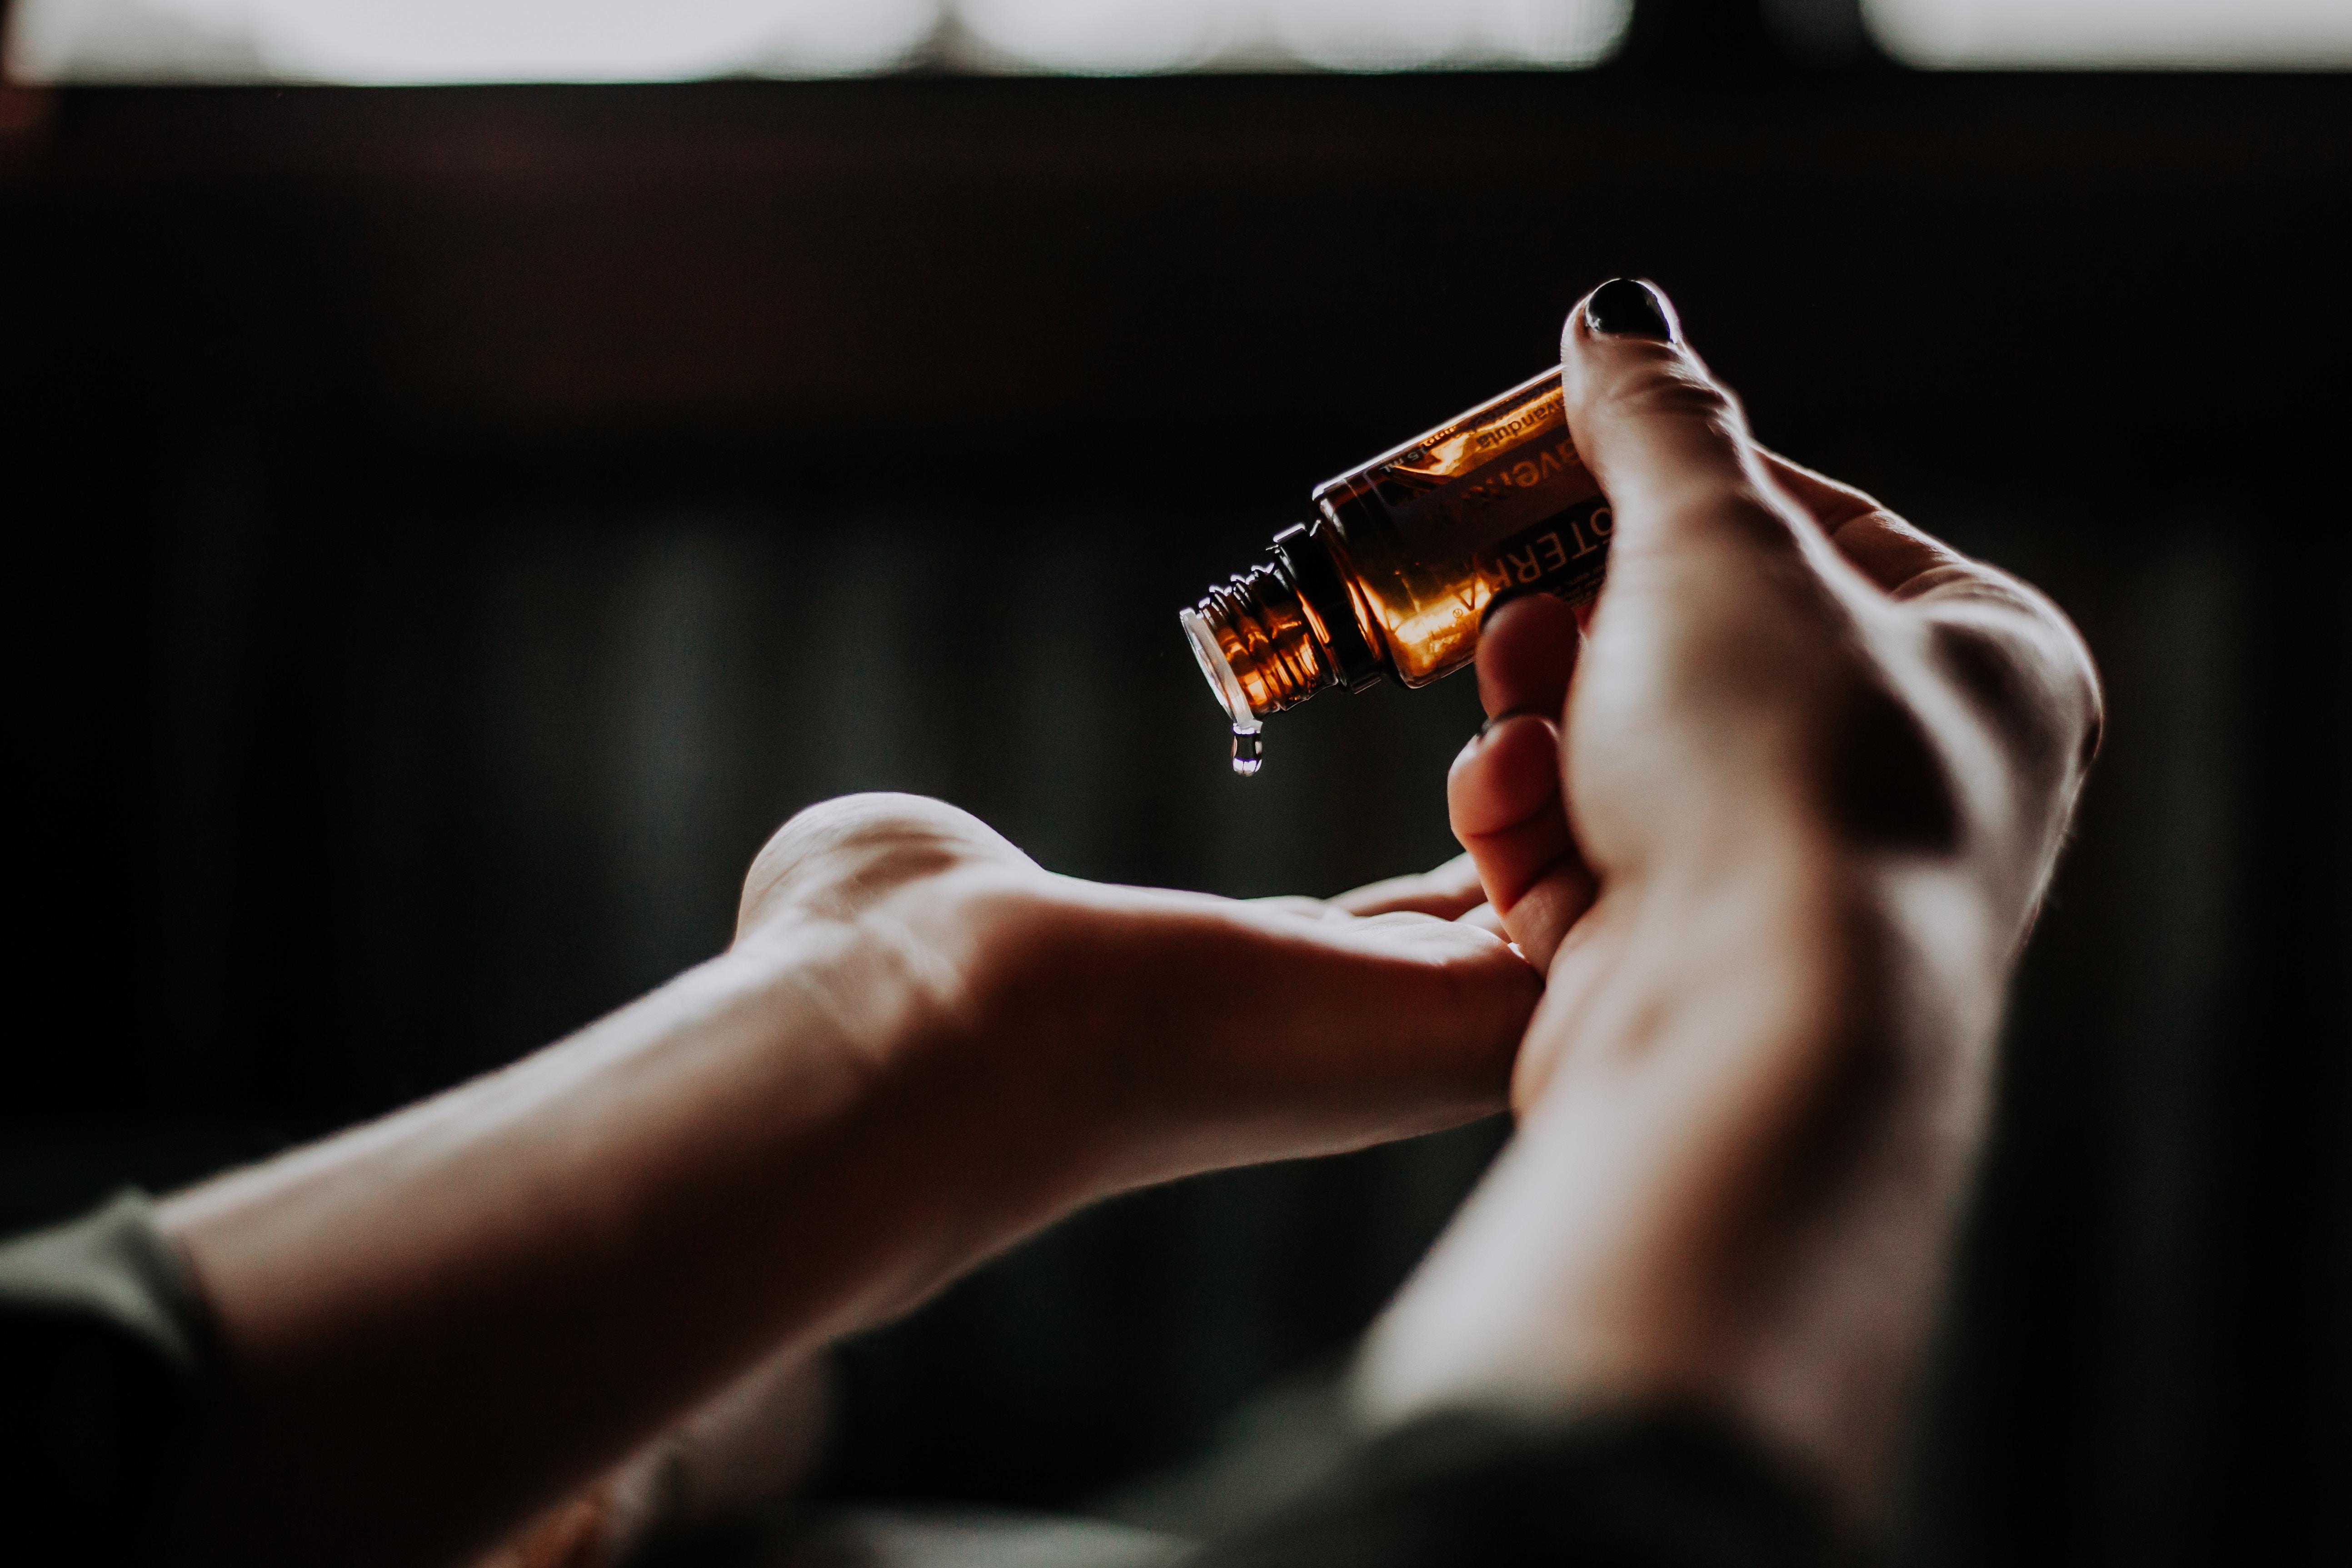 Custom Fragrance by Christin Hume on Unsplash